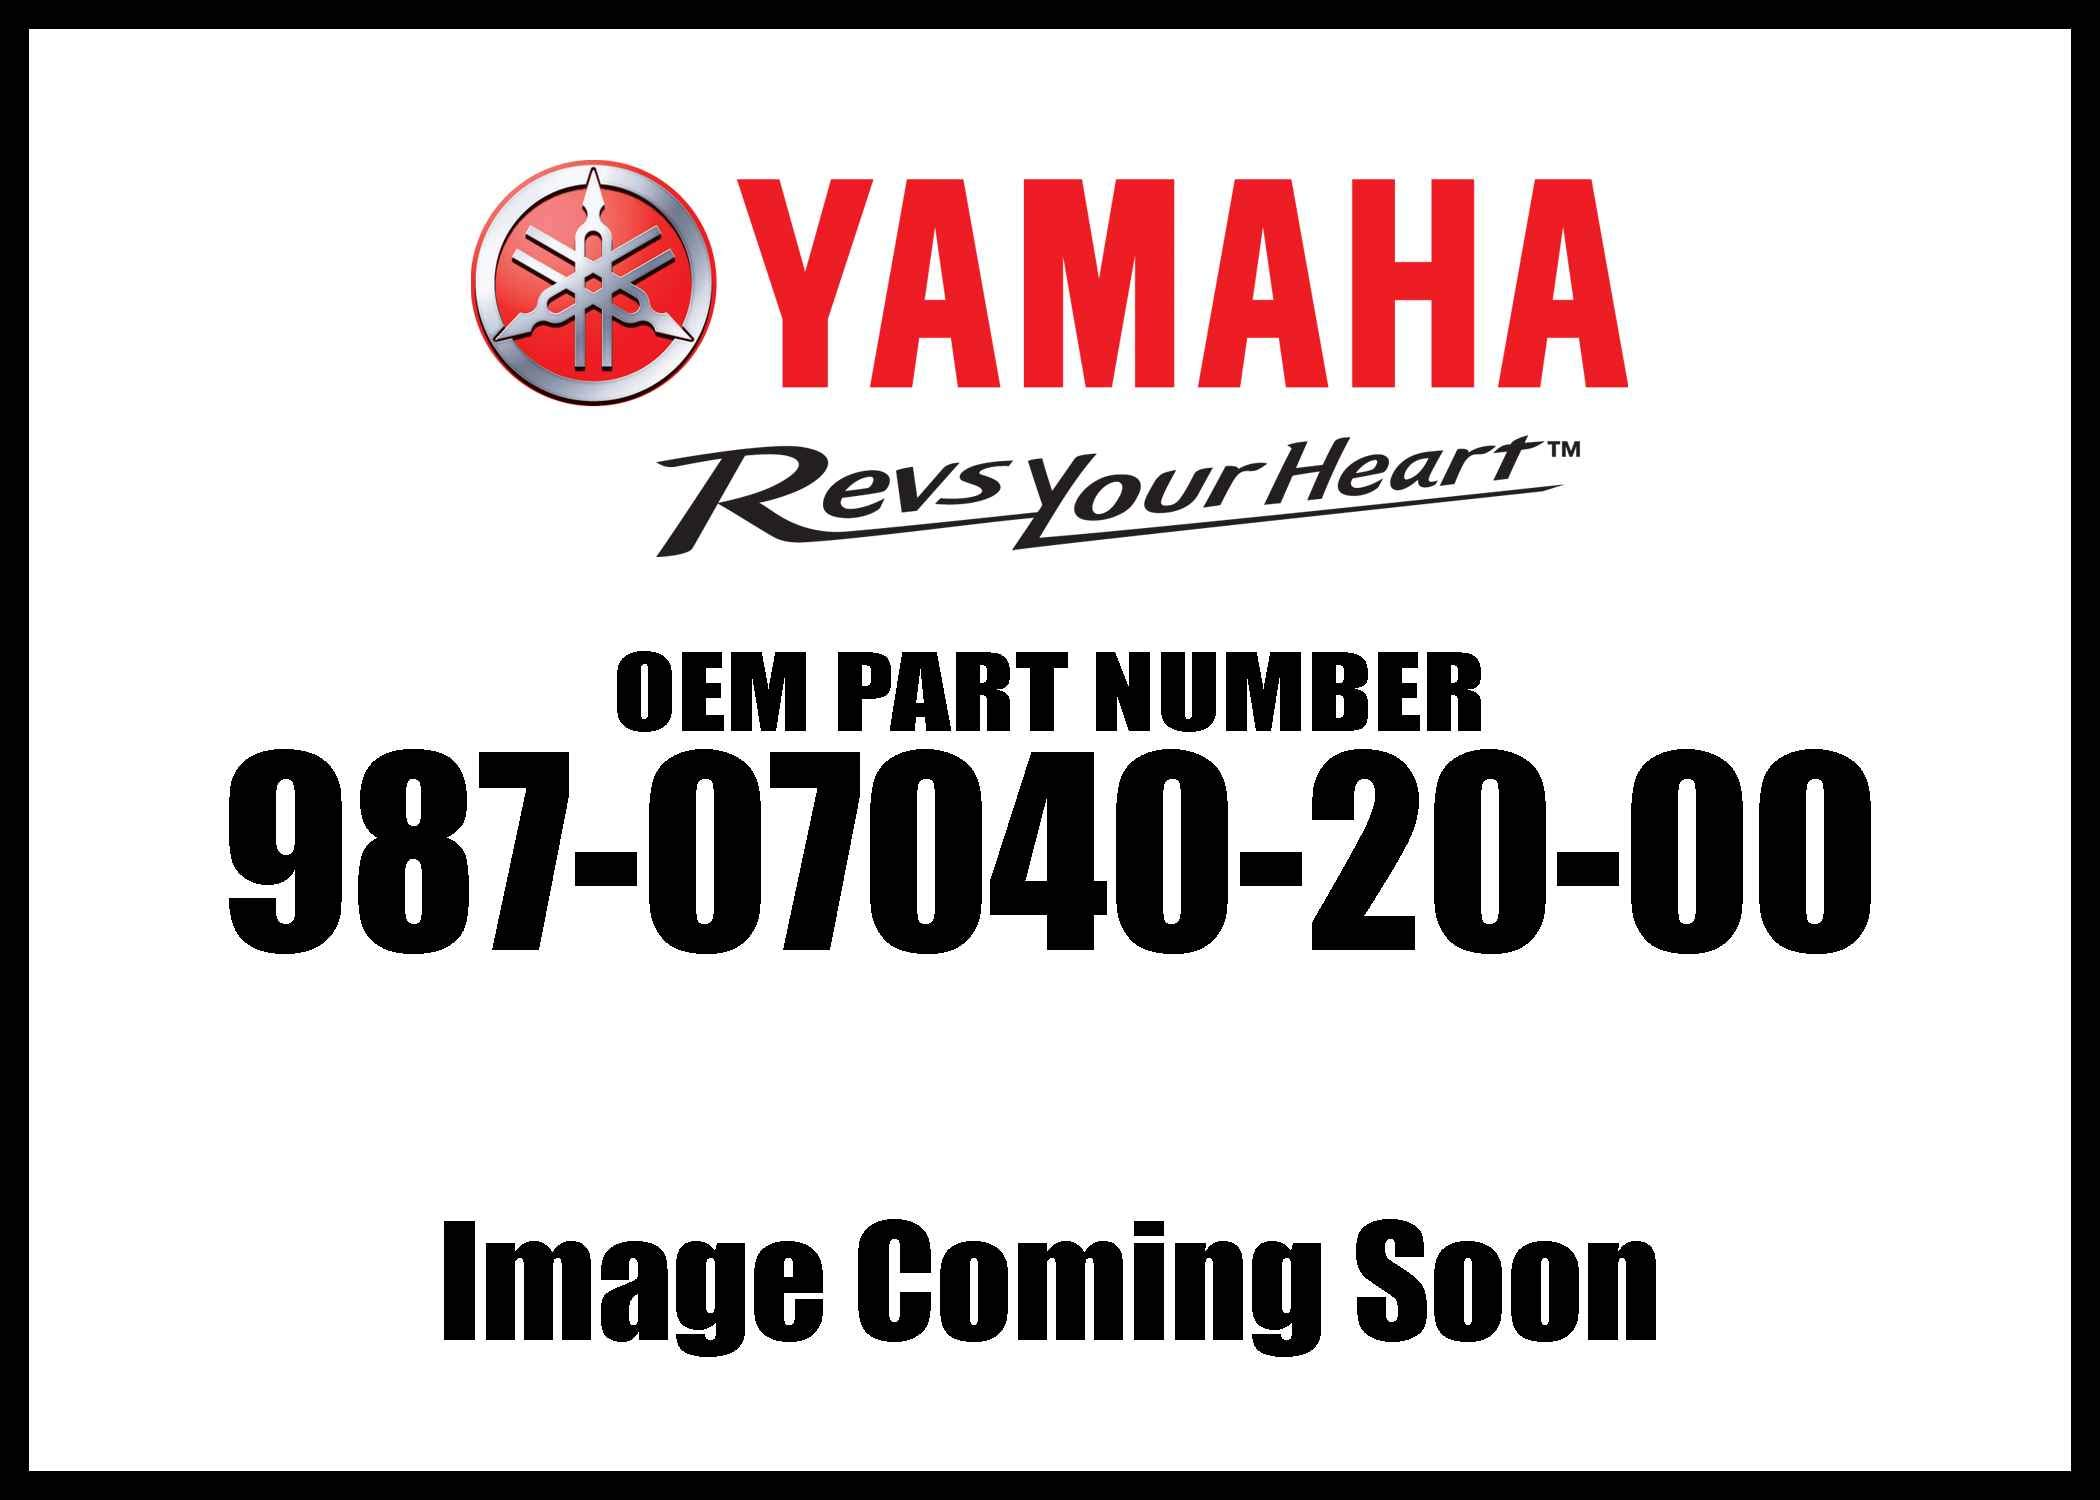 Yamaha 98707-04020-00 Screw, Flat; 987070402000 Made by Yamaha